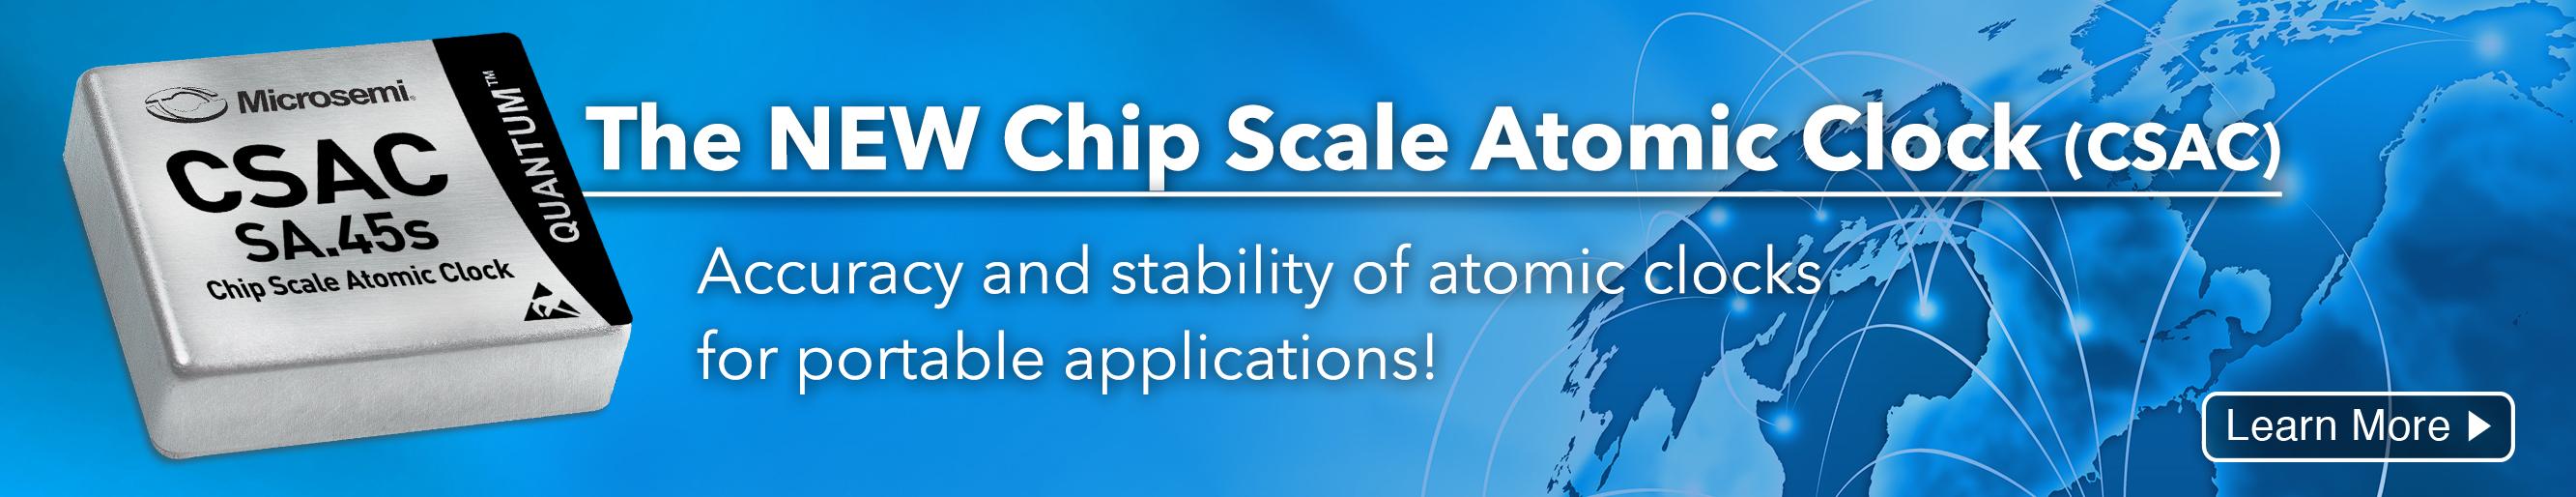 Quantum™ SA.45s Chip Scale Atomic Clock (CSAC)